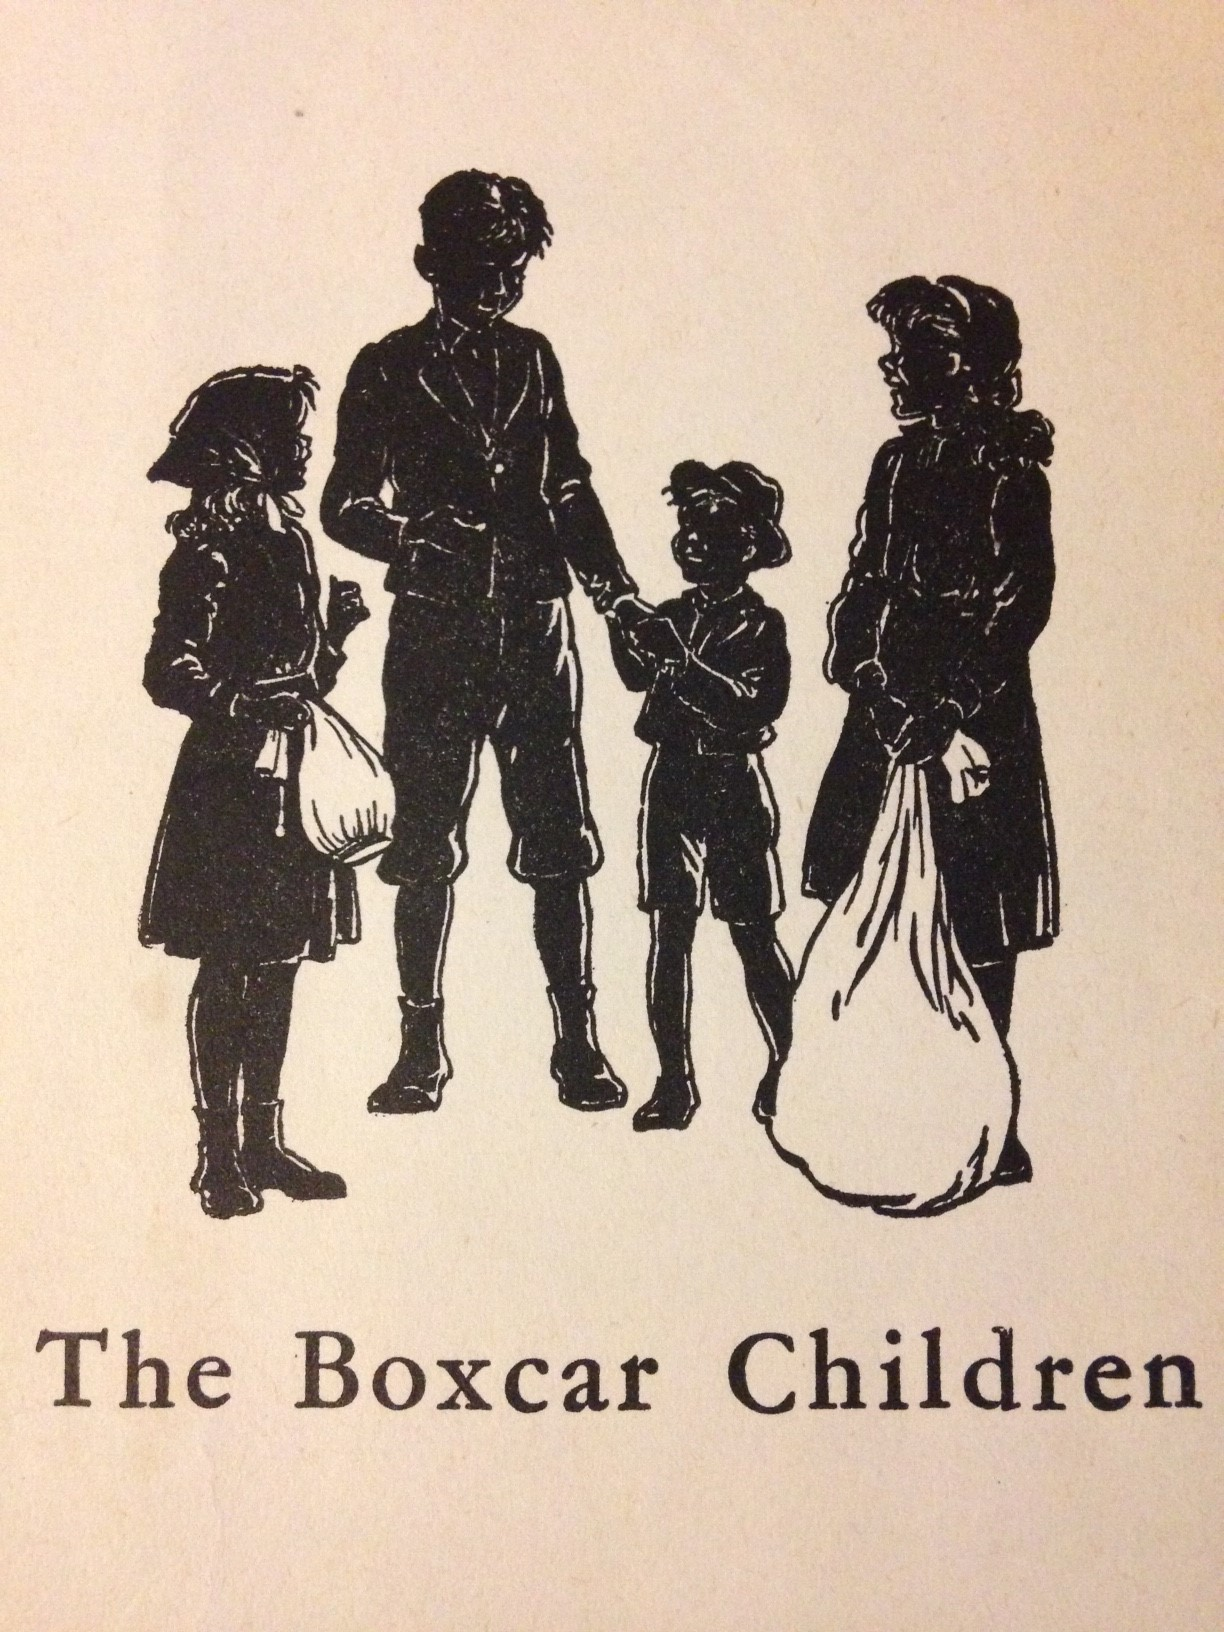 TheBoxcarChildren